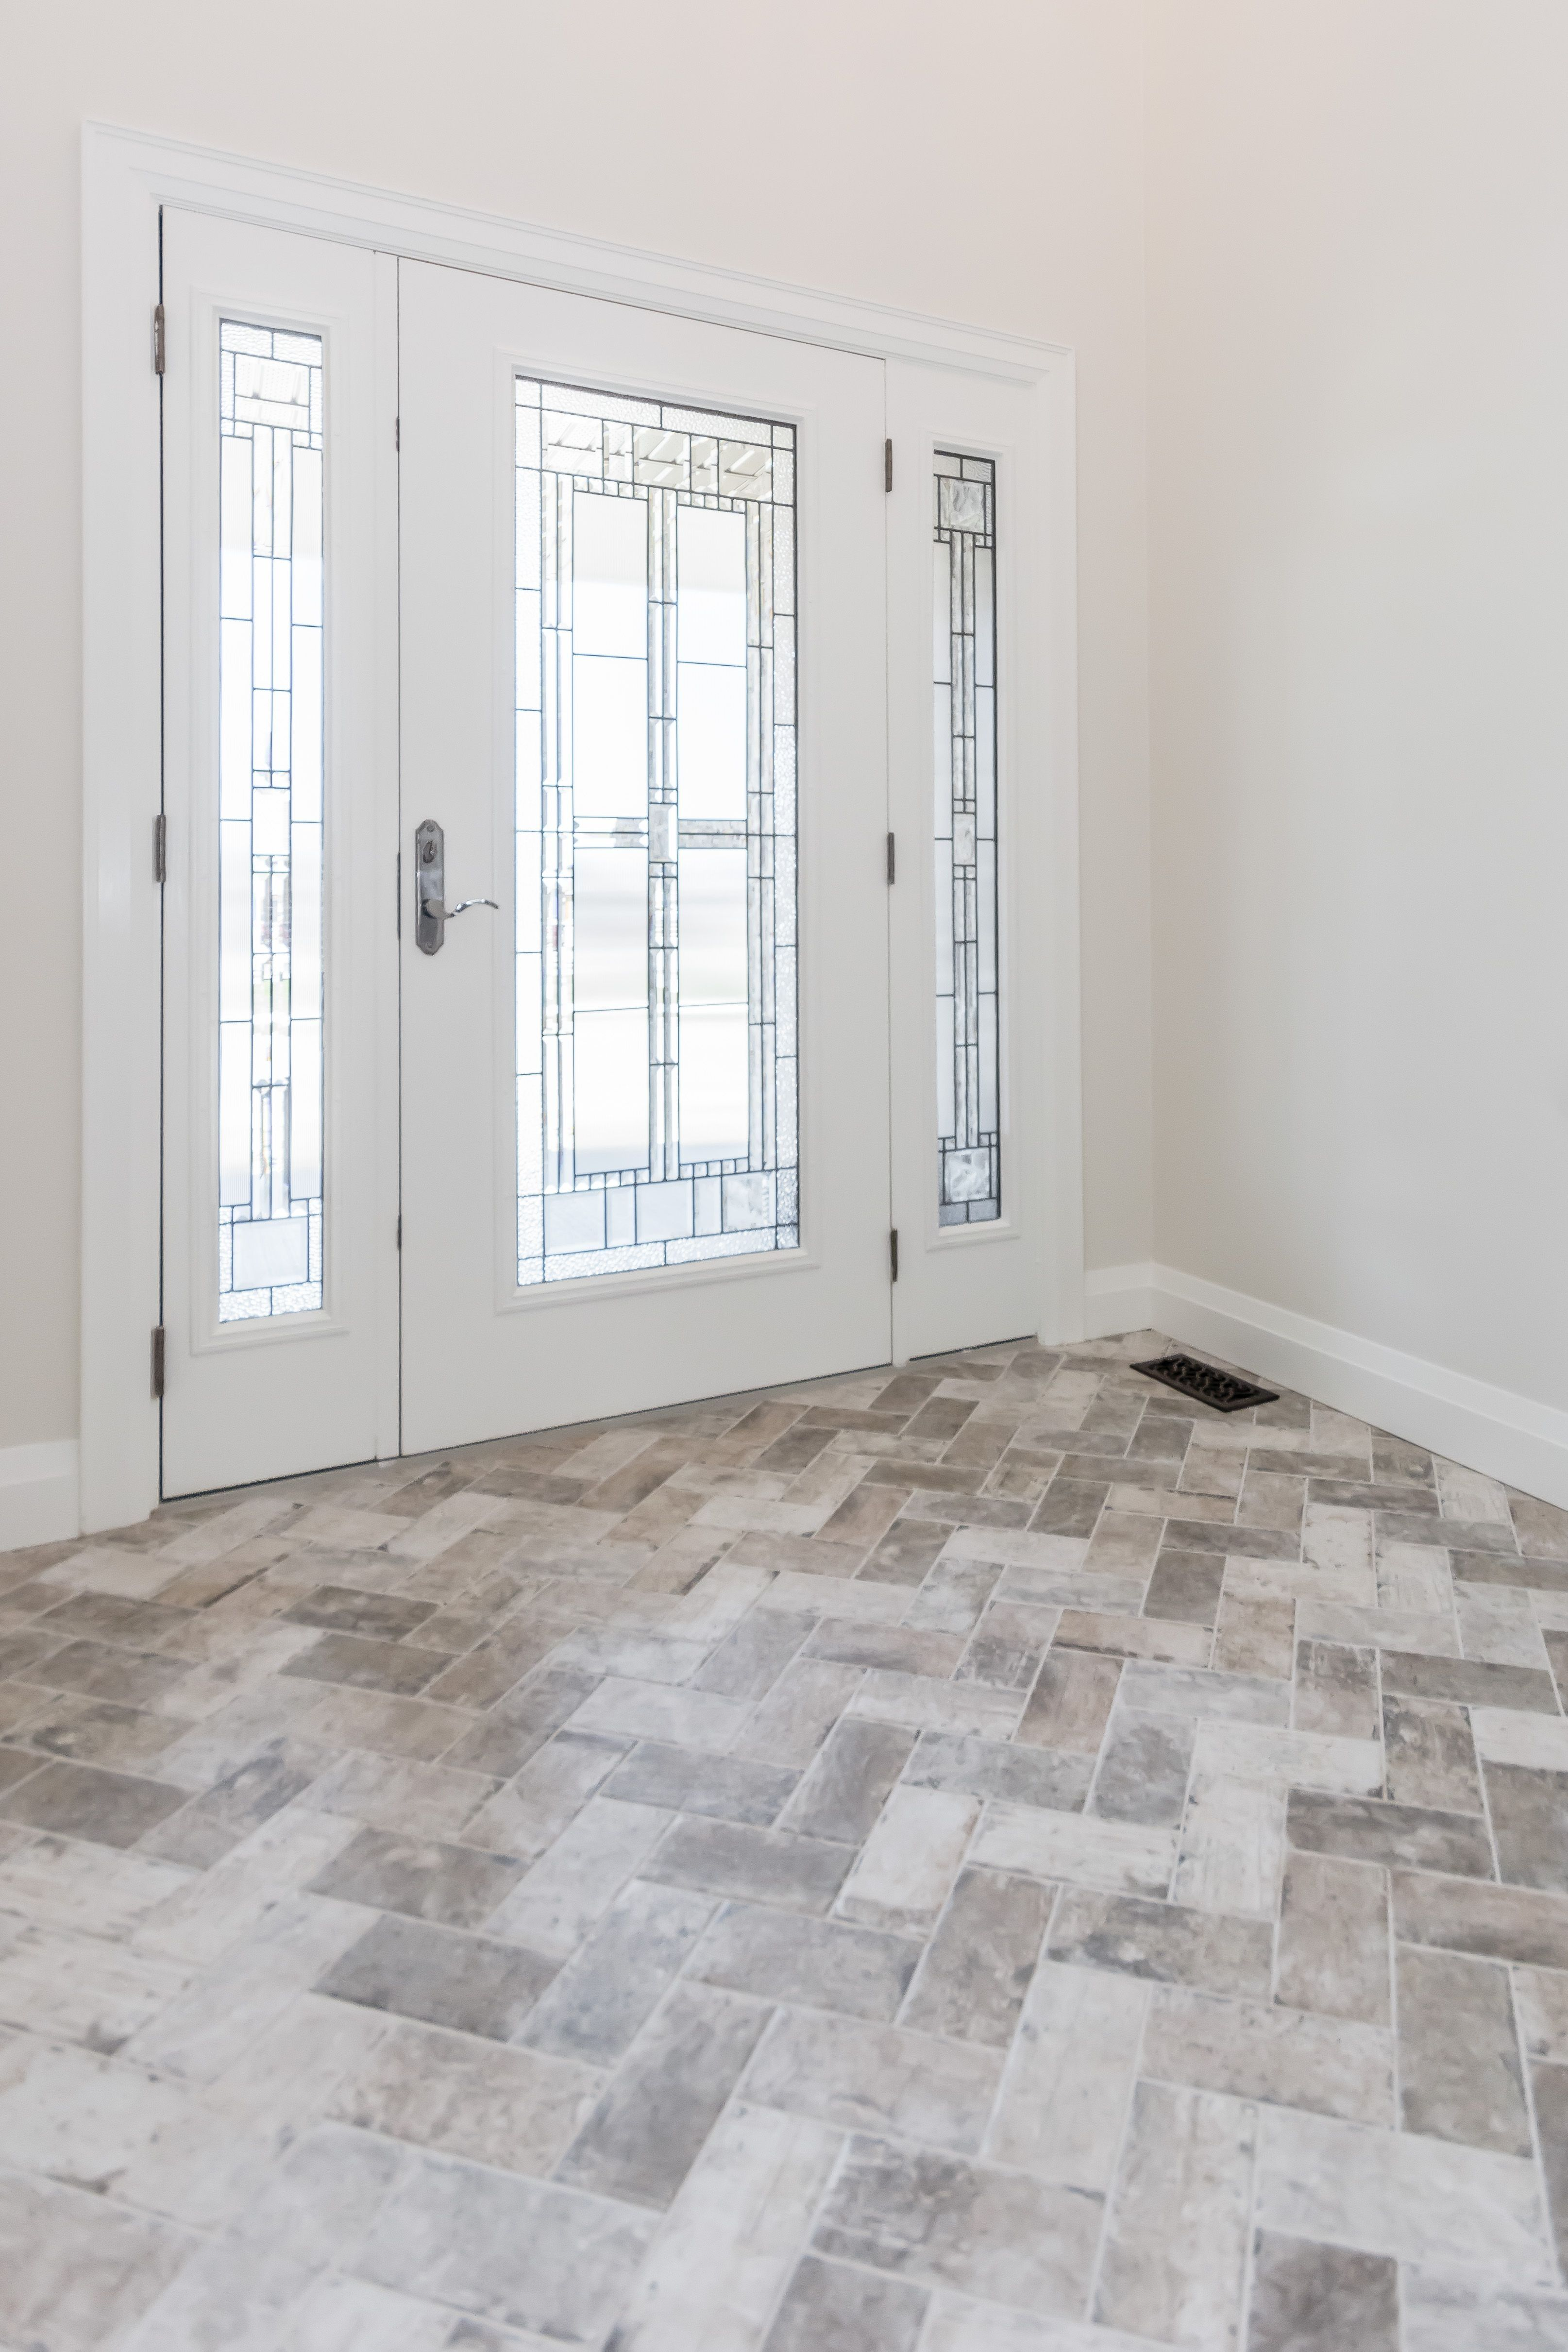 41 Enchanting Porcelain Tile Ideas For Kitchen Floors Brick Tile